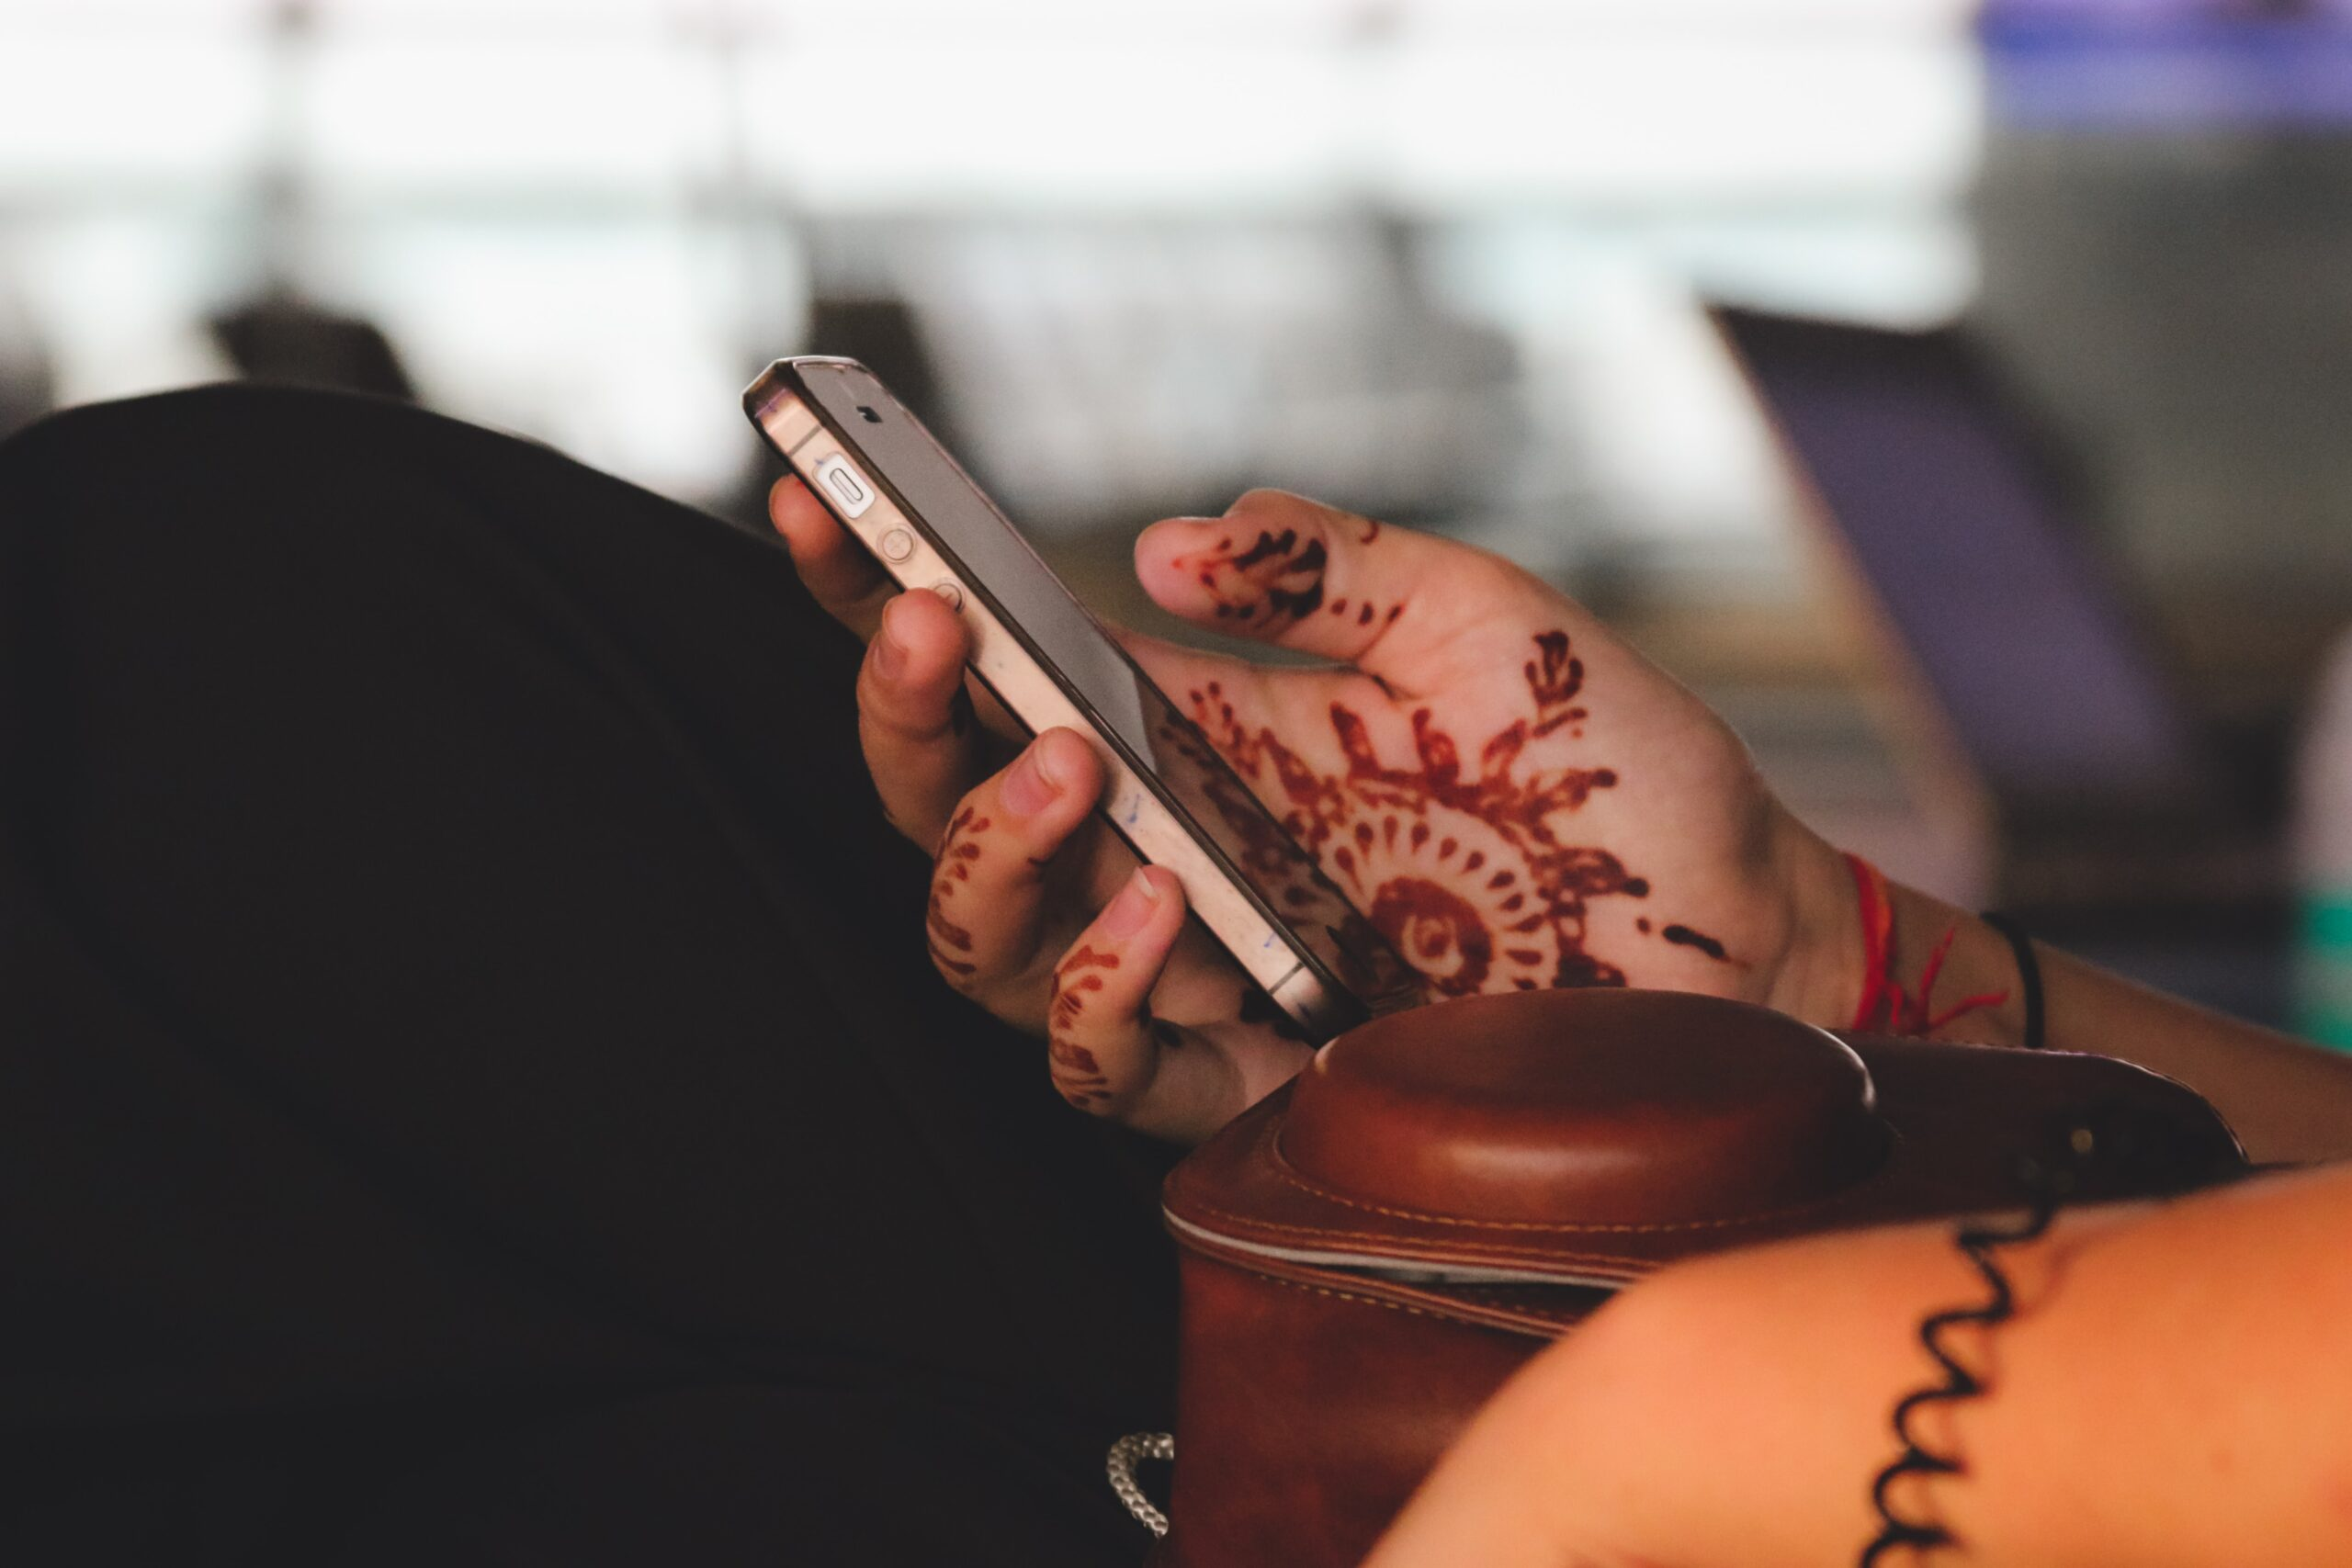 Apple's New Online Store Meets Growing Demand in India